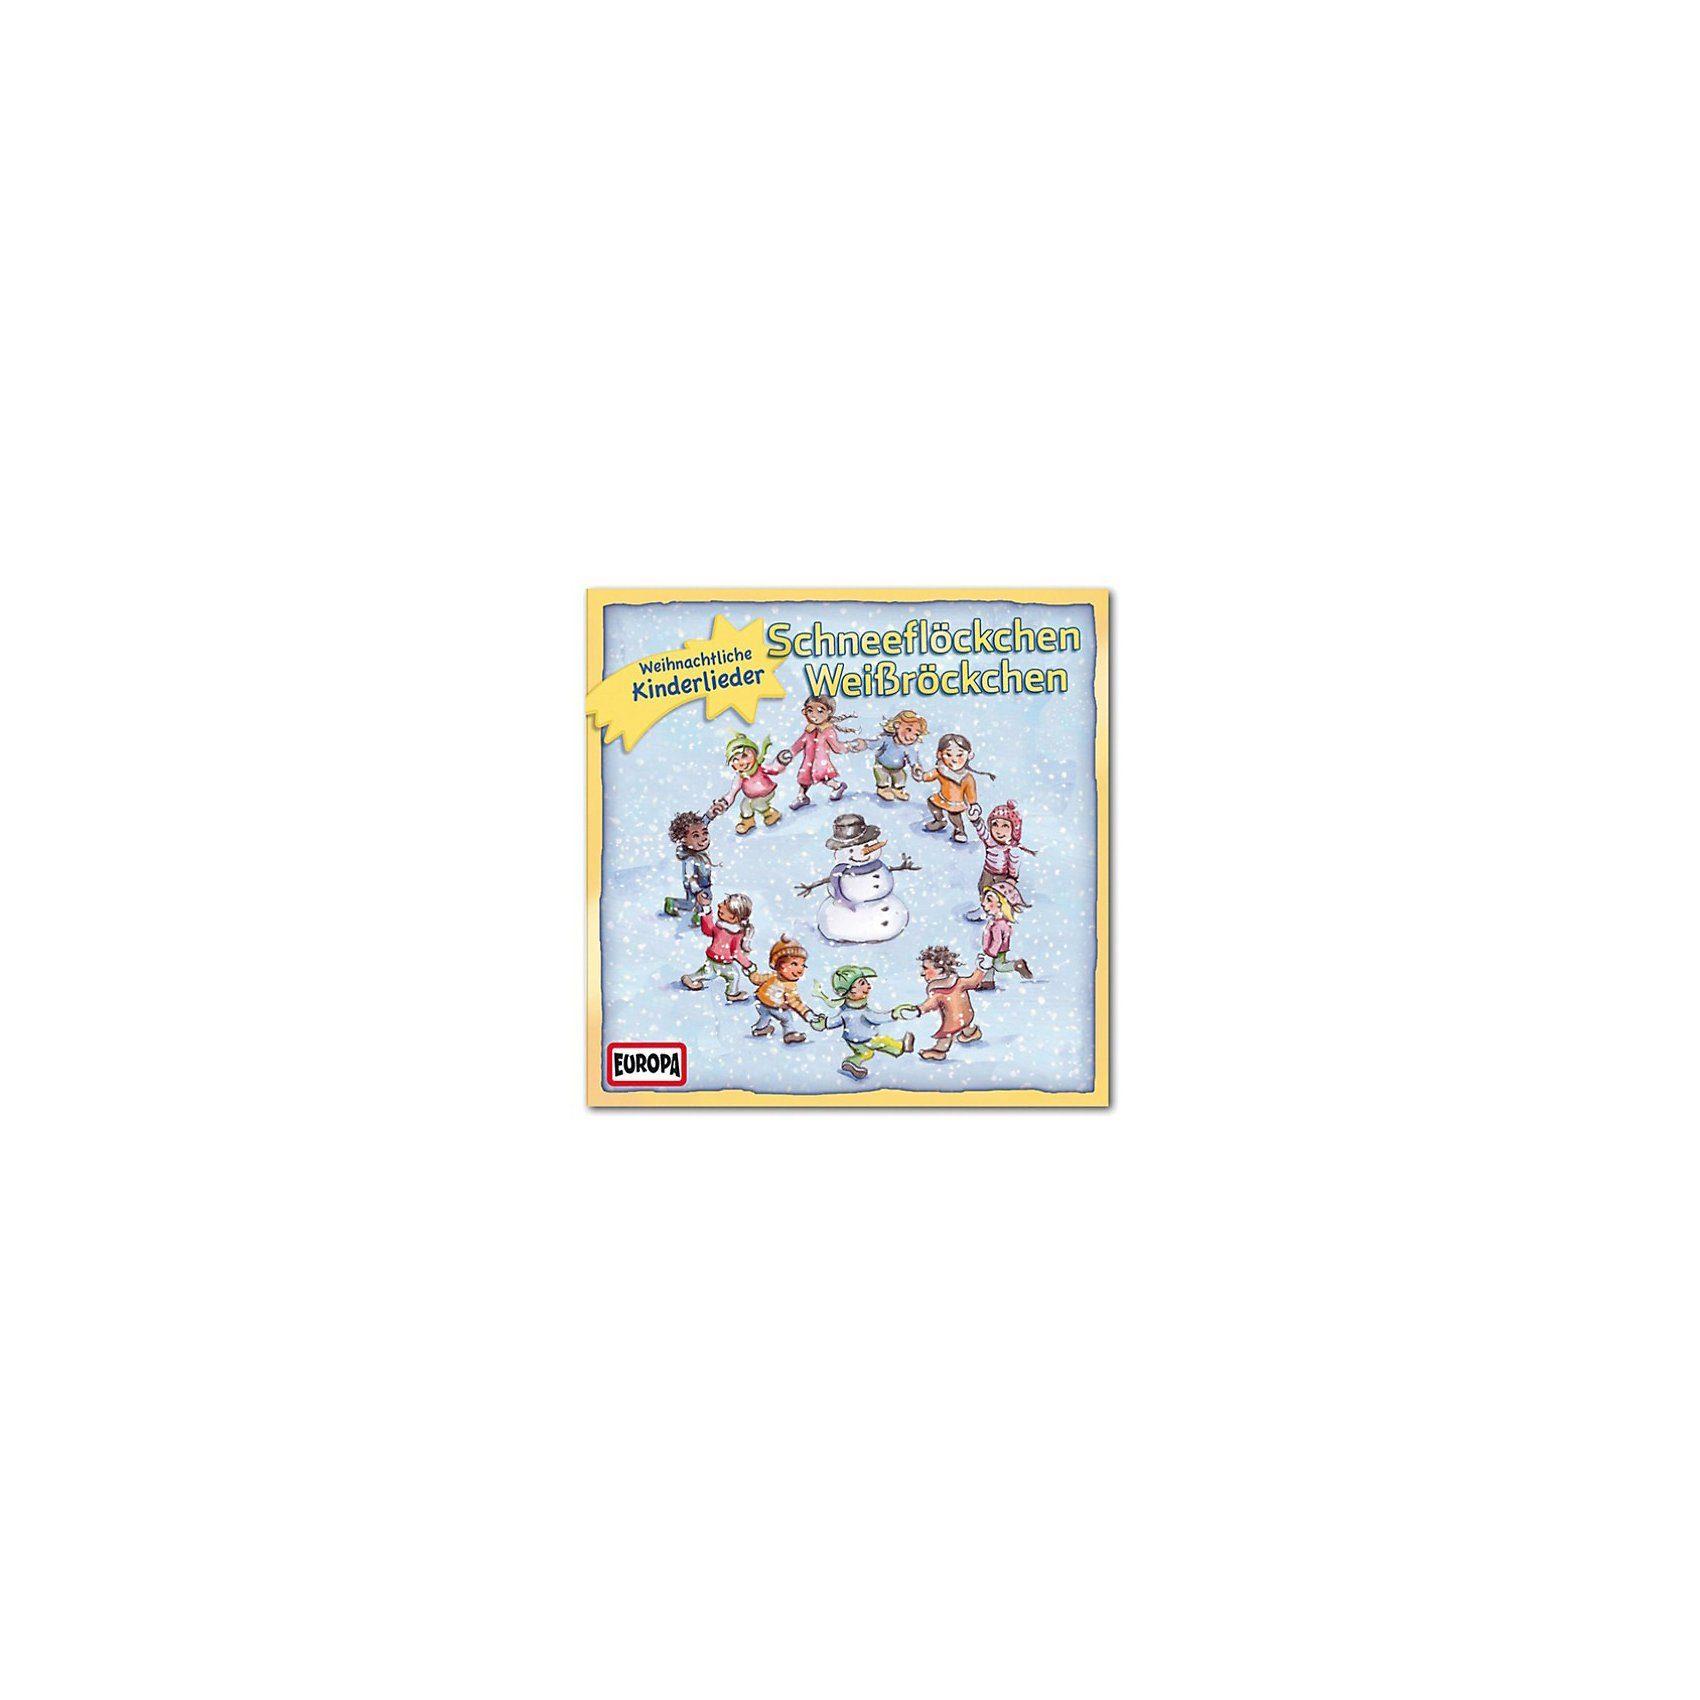 Sony CD Fun Kids - Schneeflöckchen, Weissröckchen